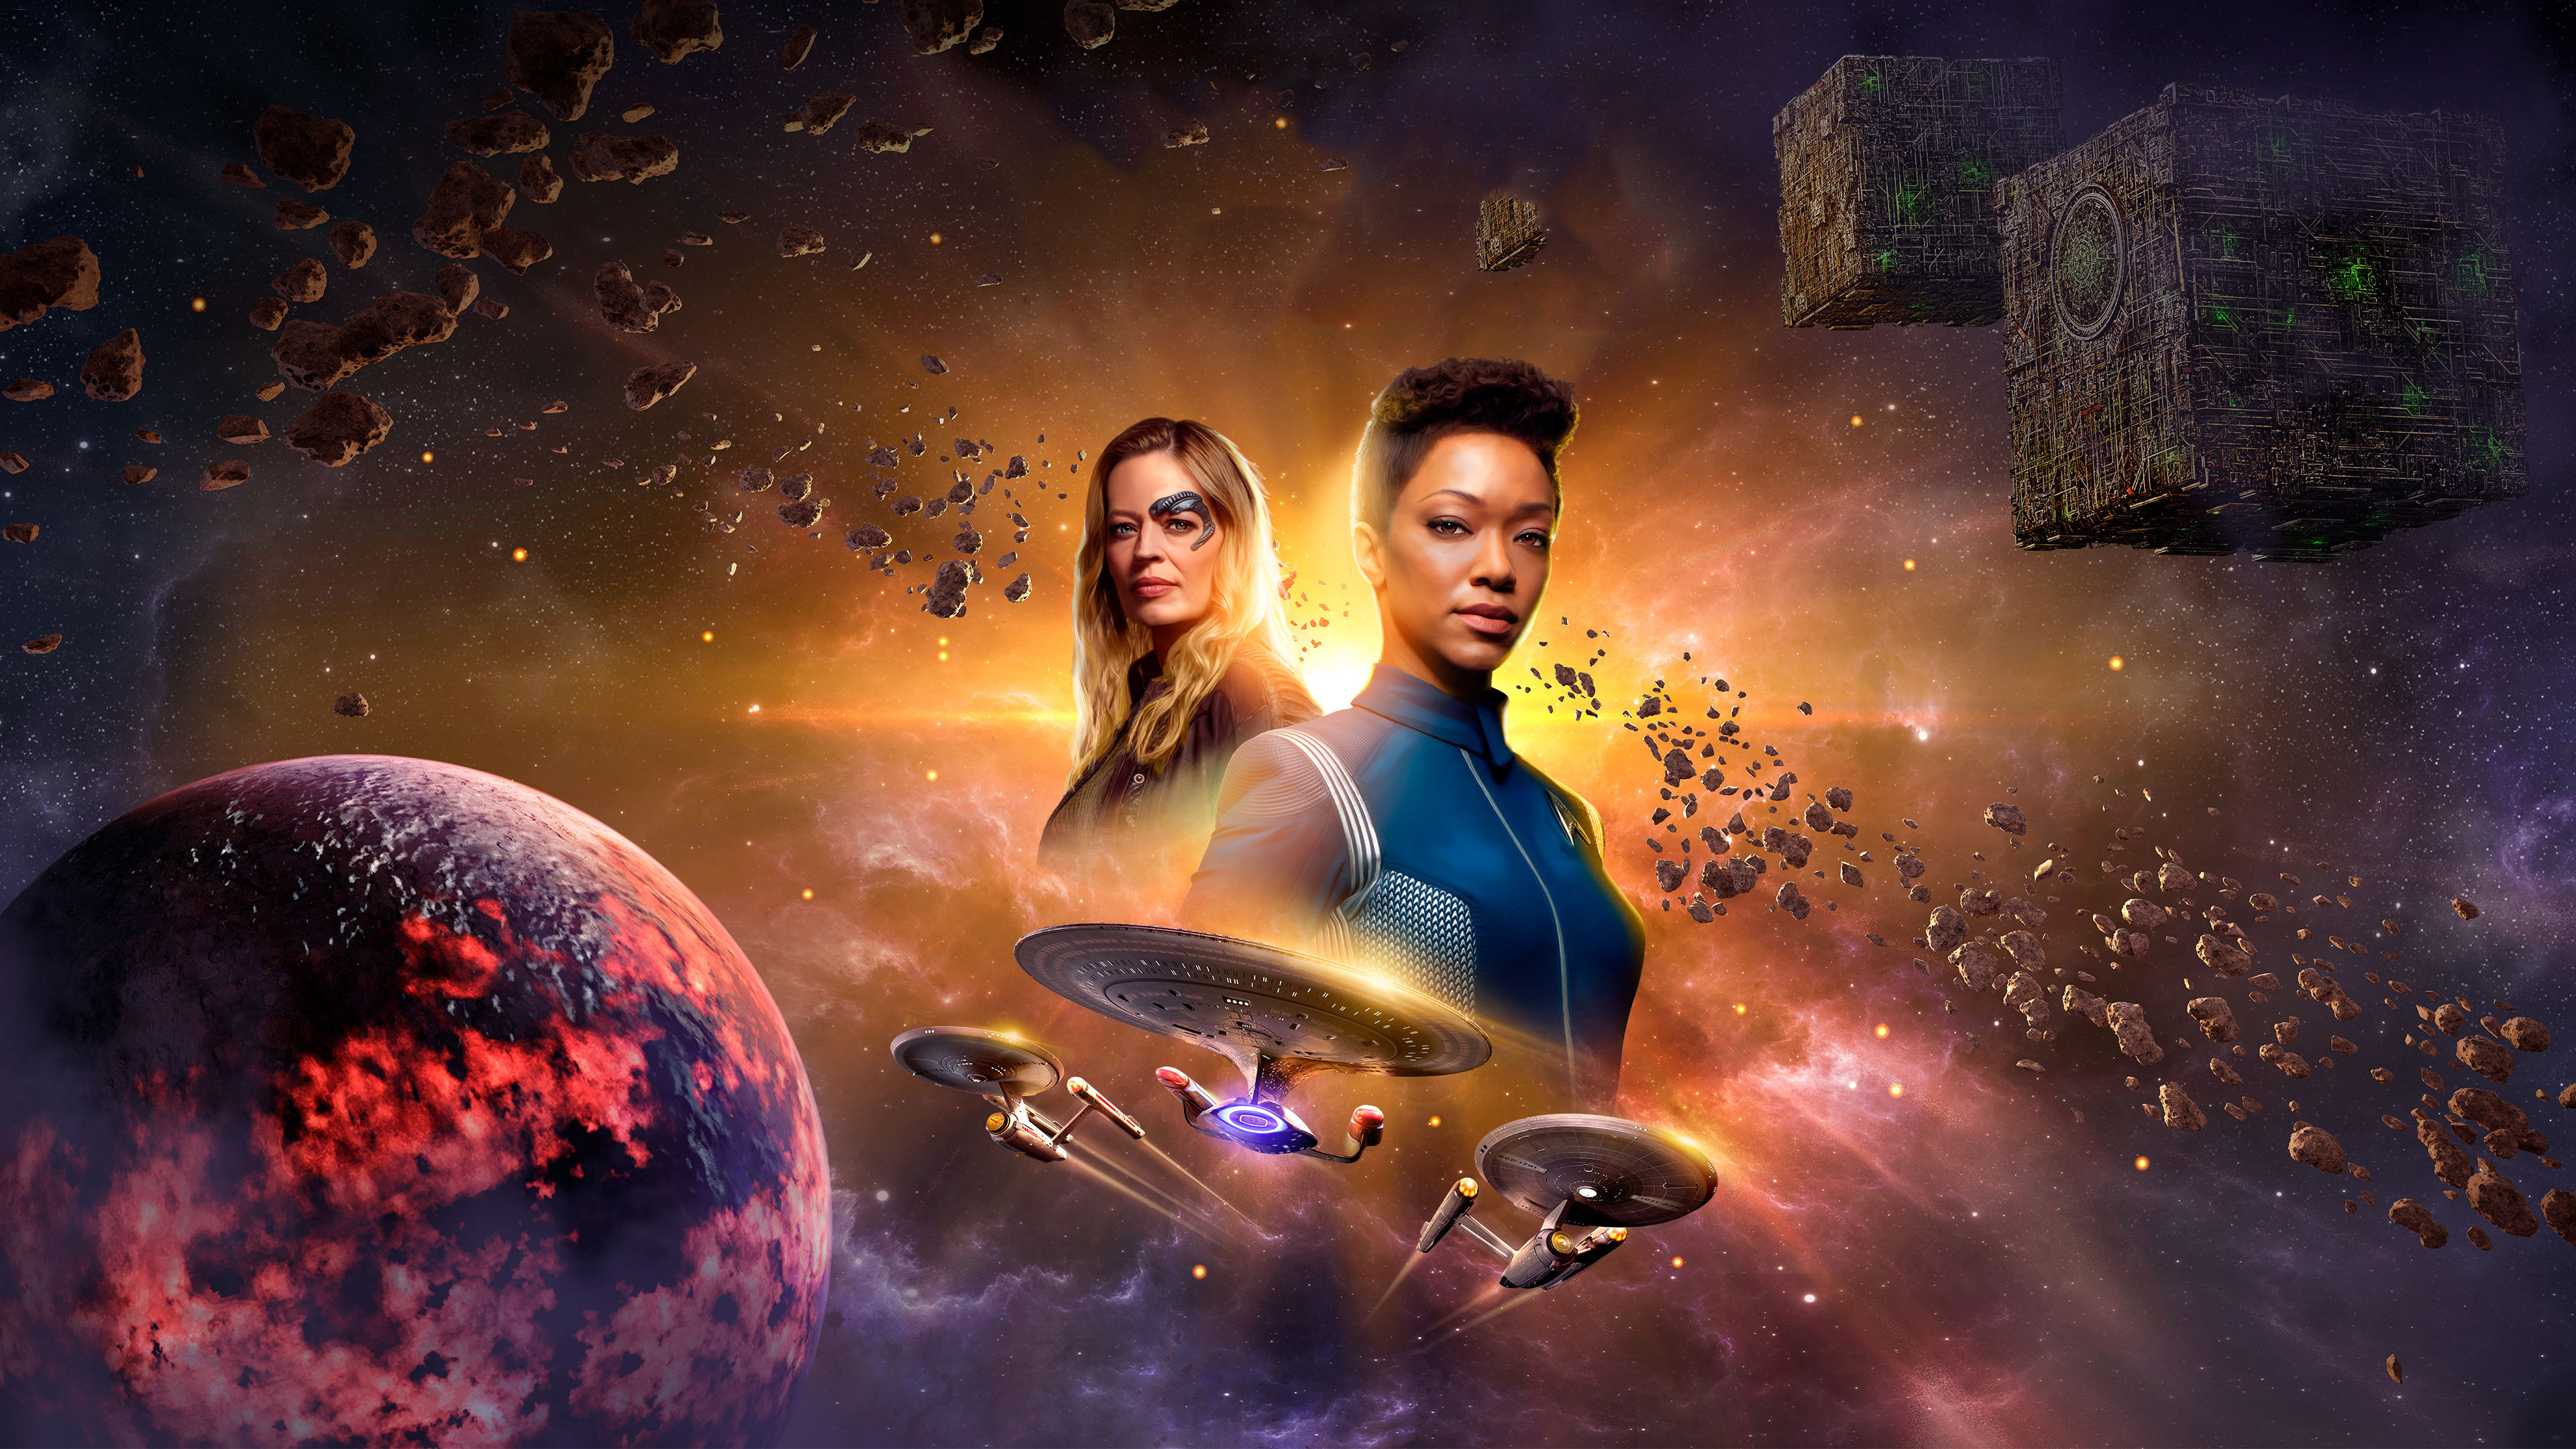 Star Trek Online 2020 Game Wallpaper, HD Games 4K